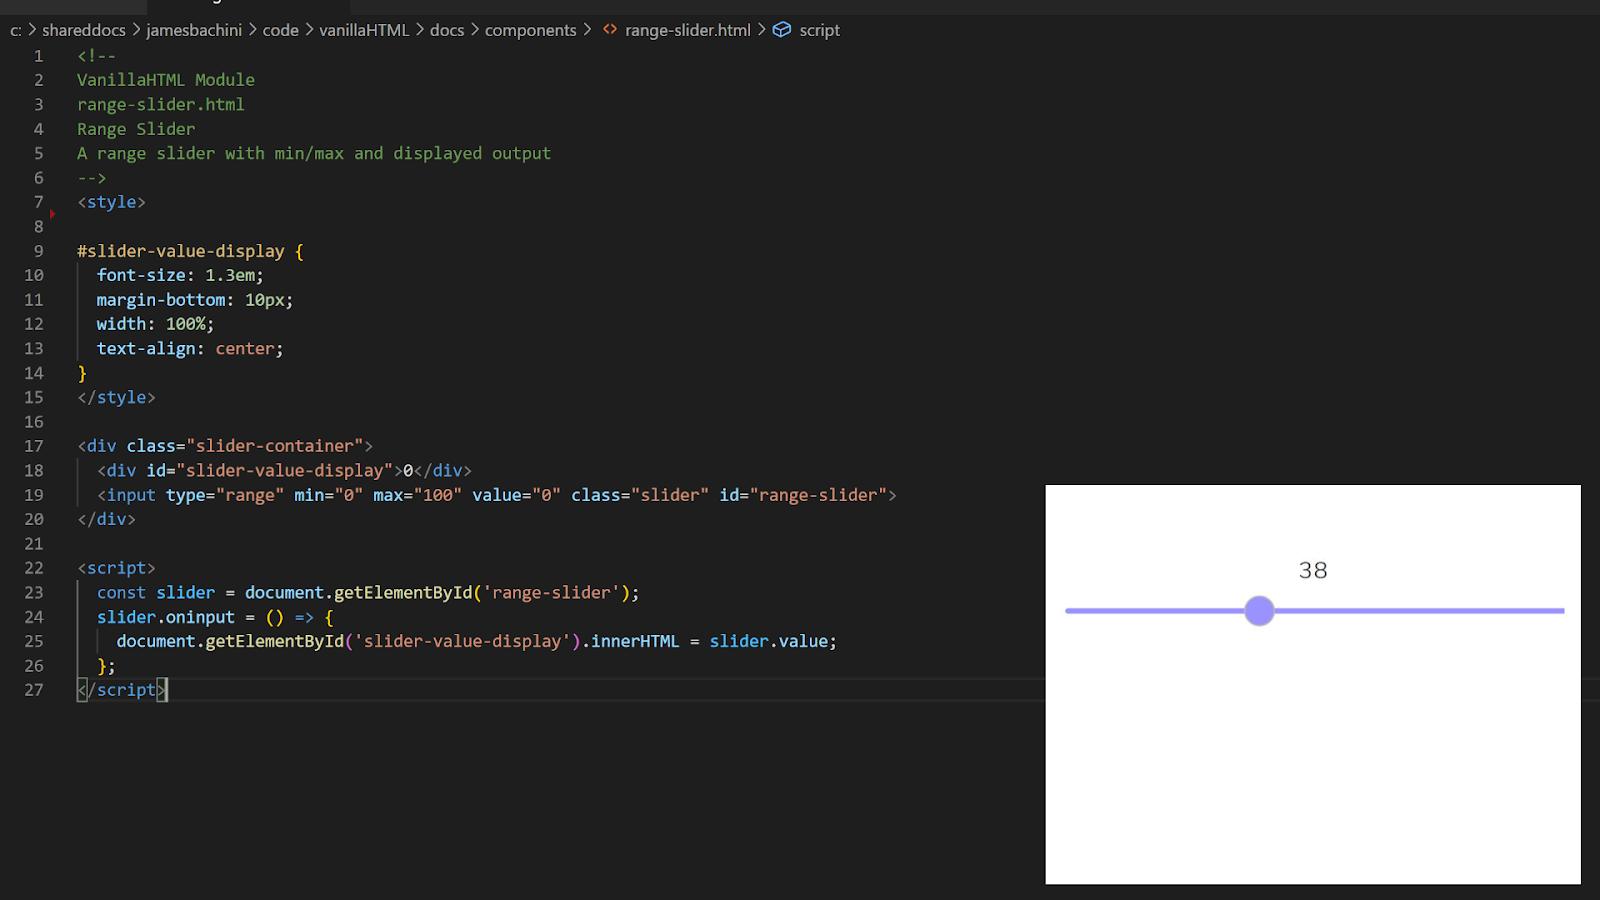 Vanilla HTML | No. 1 Free HTML Boilerplate 2